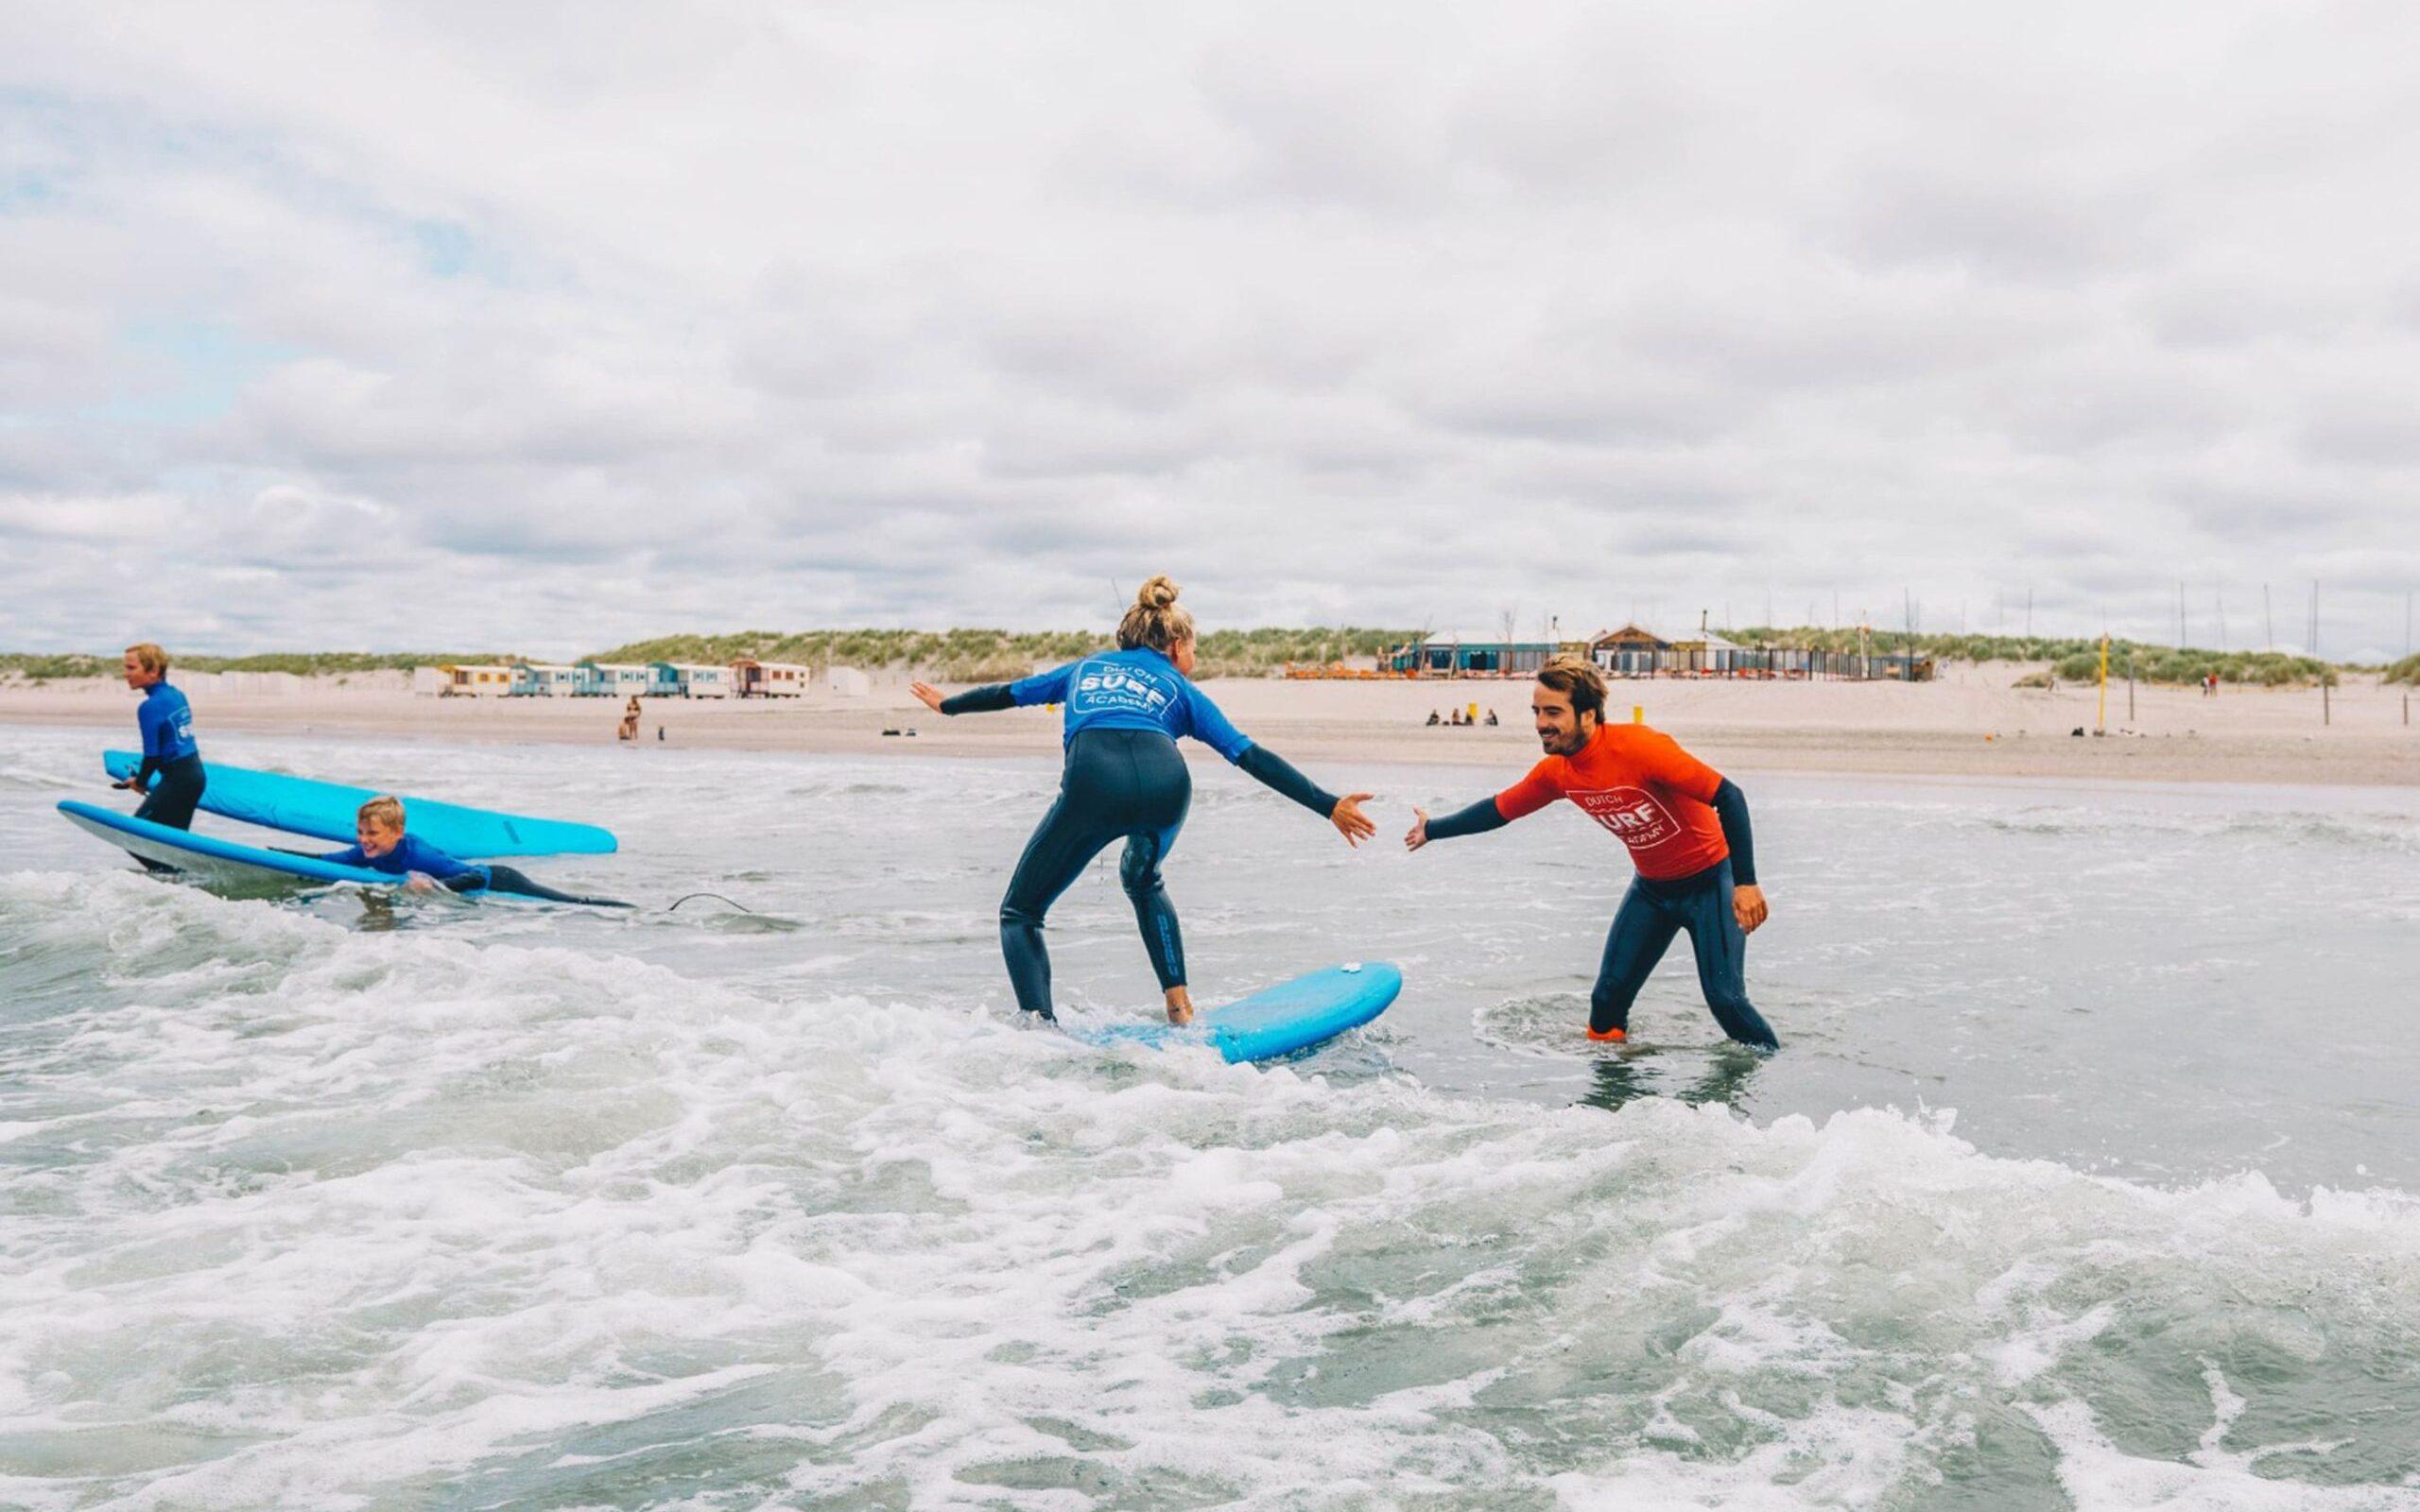 Meisje aanwijzingen surfen Surfleraar